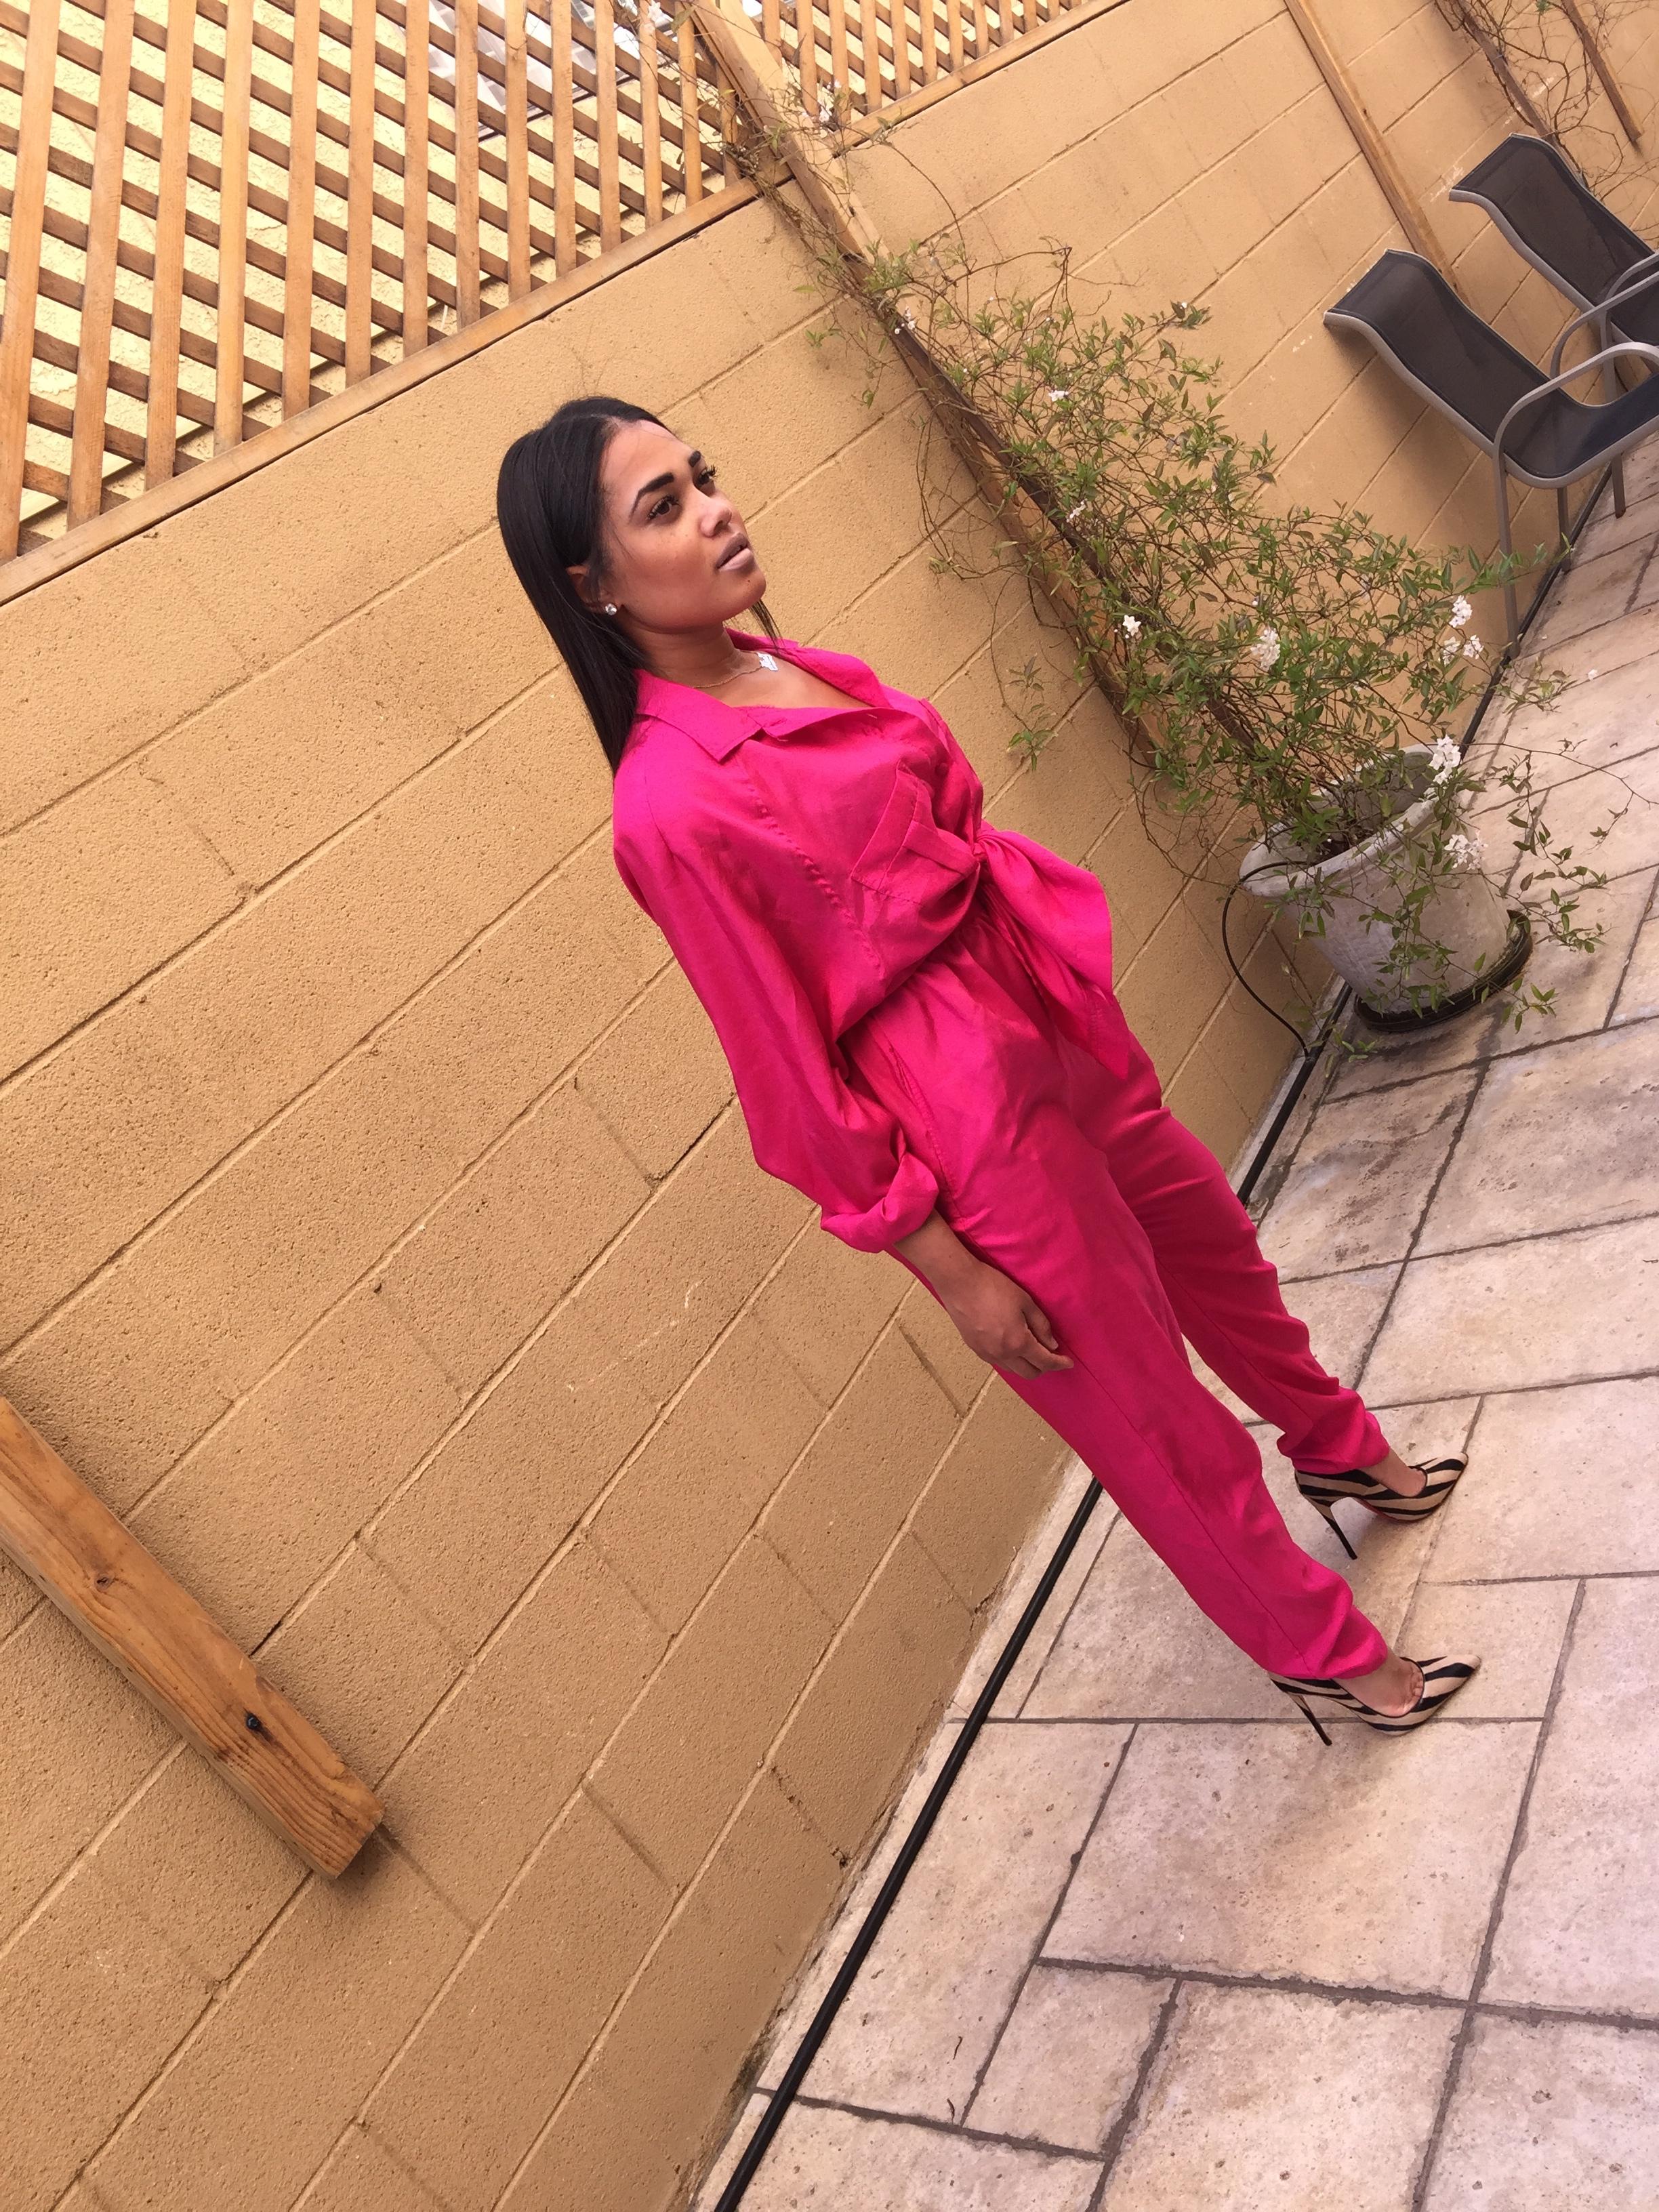 mia-campbell-pinkgrasshopper-vintage-how-to-wear-monochrome-suit